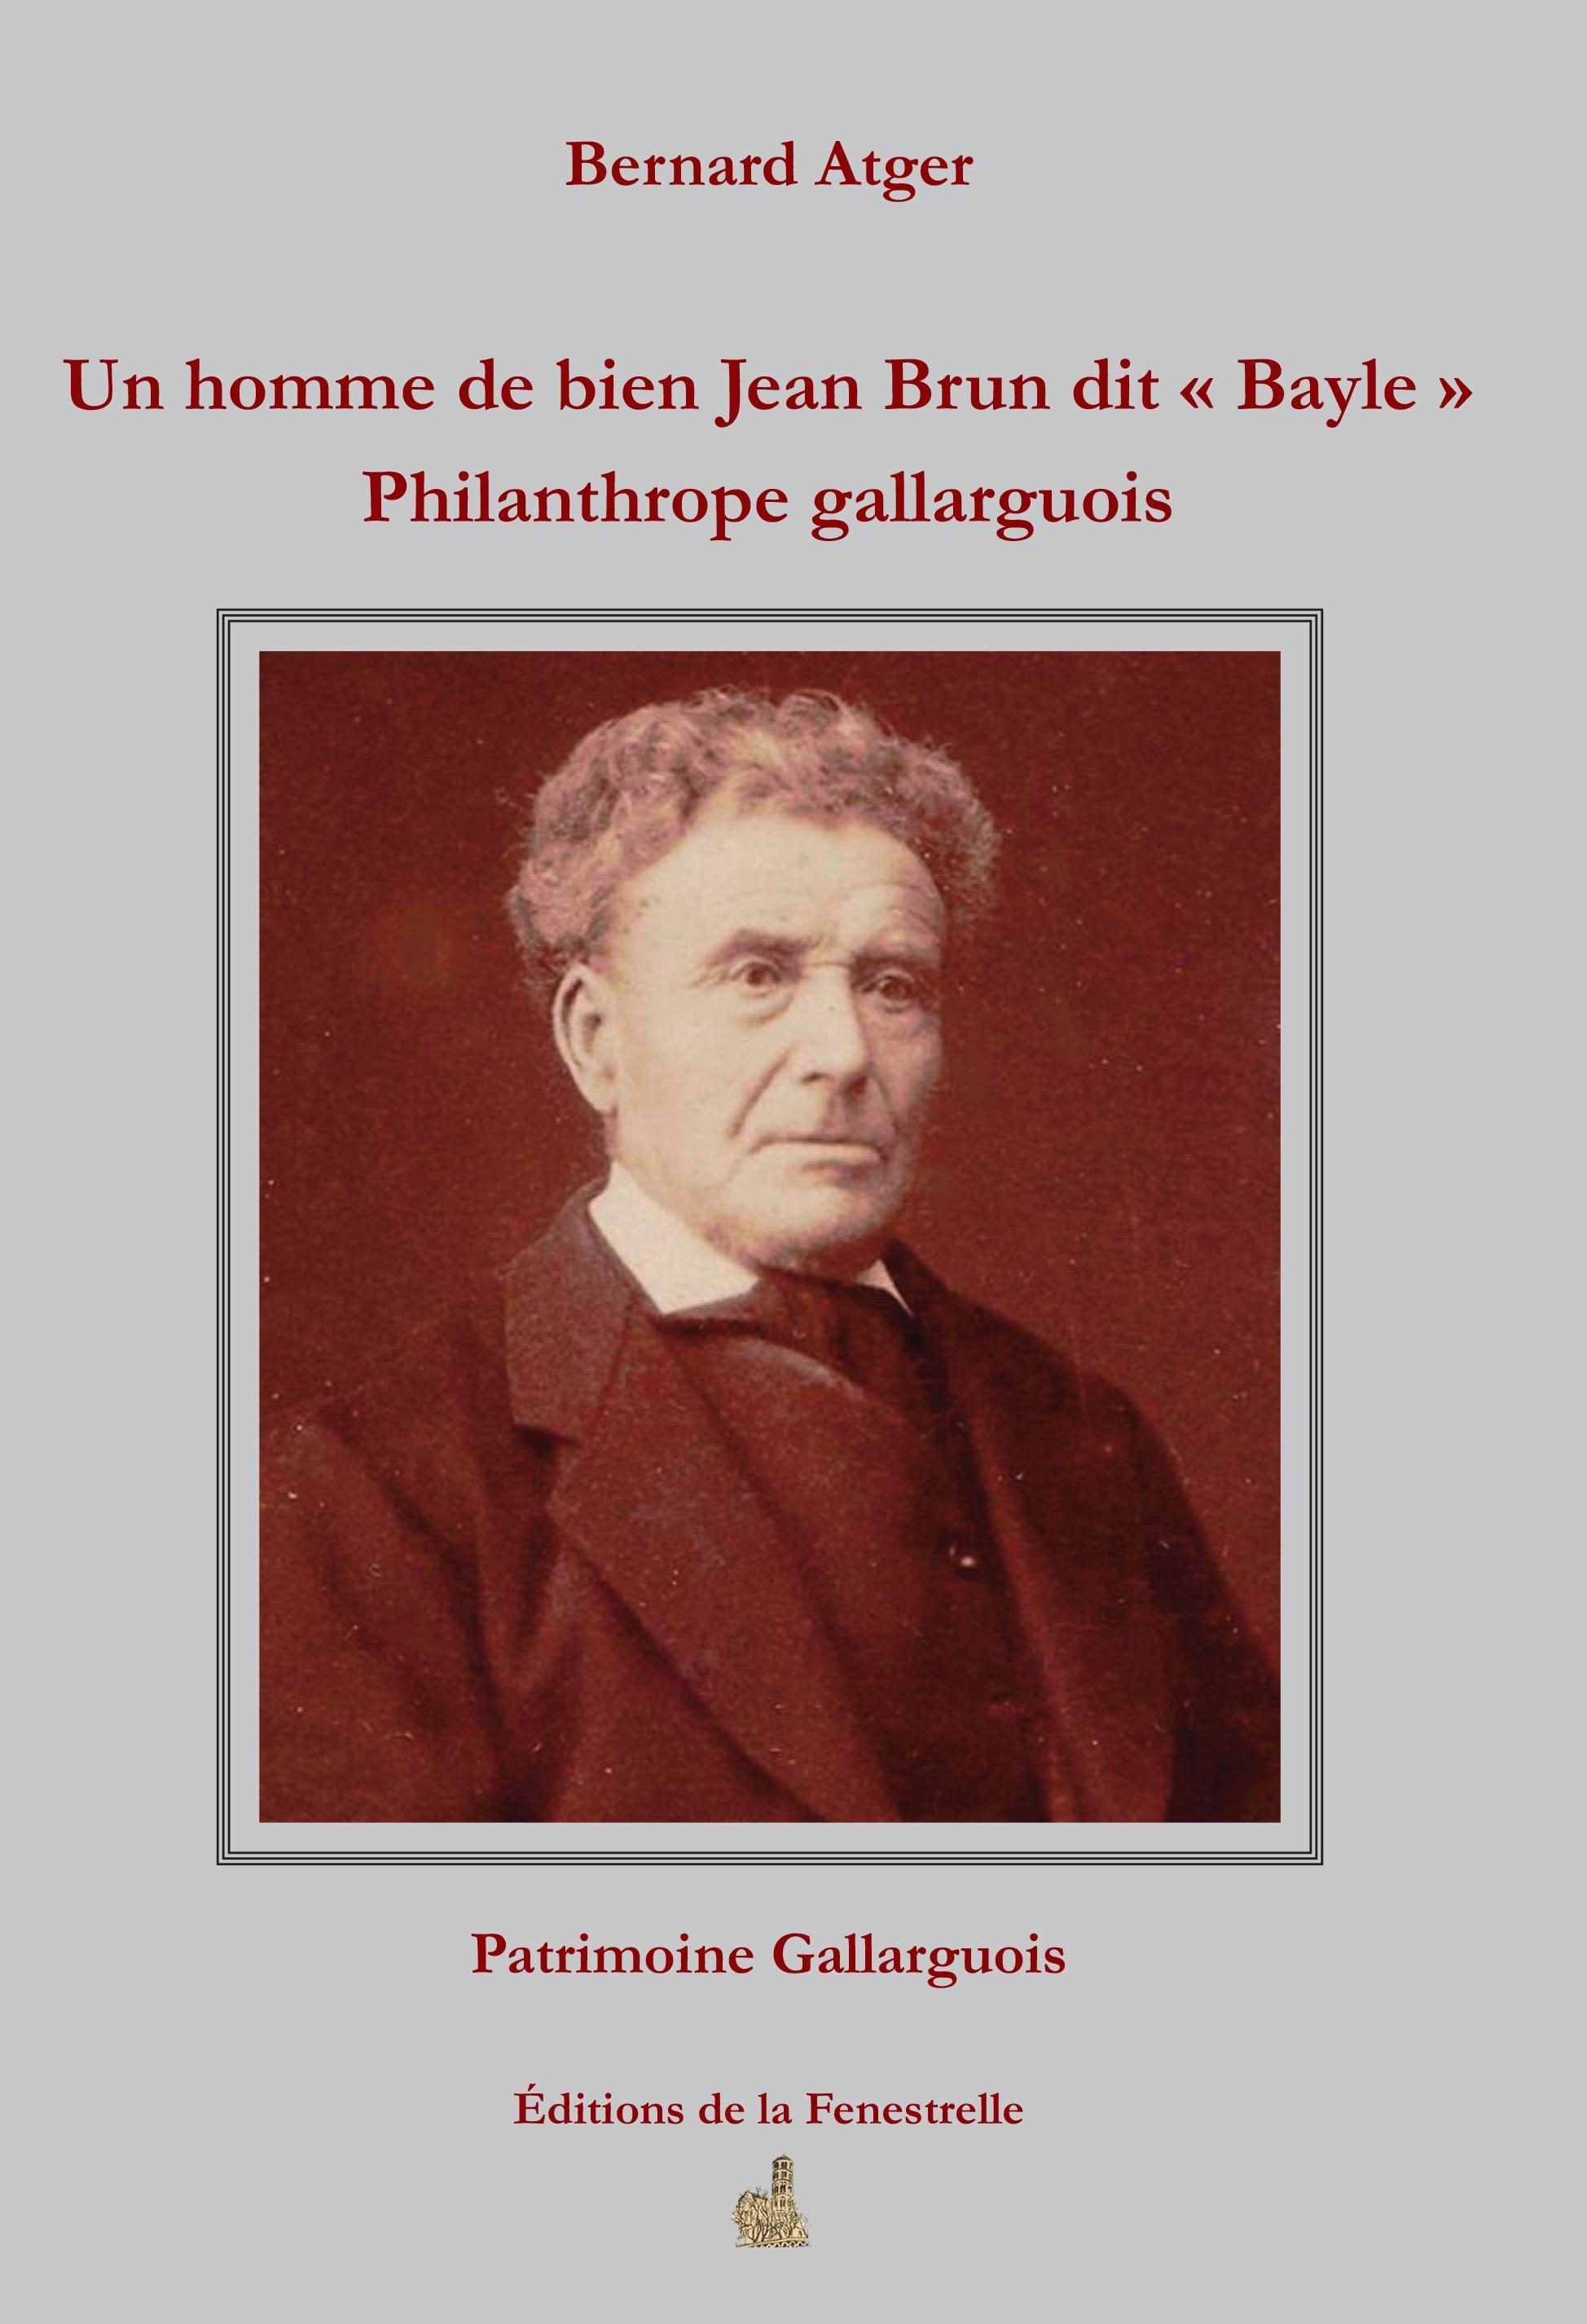 Un homme de bien Jean Brun dit « Bayle » Philanthrope gallarguois